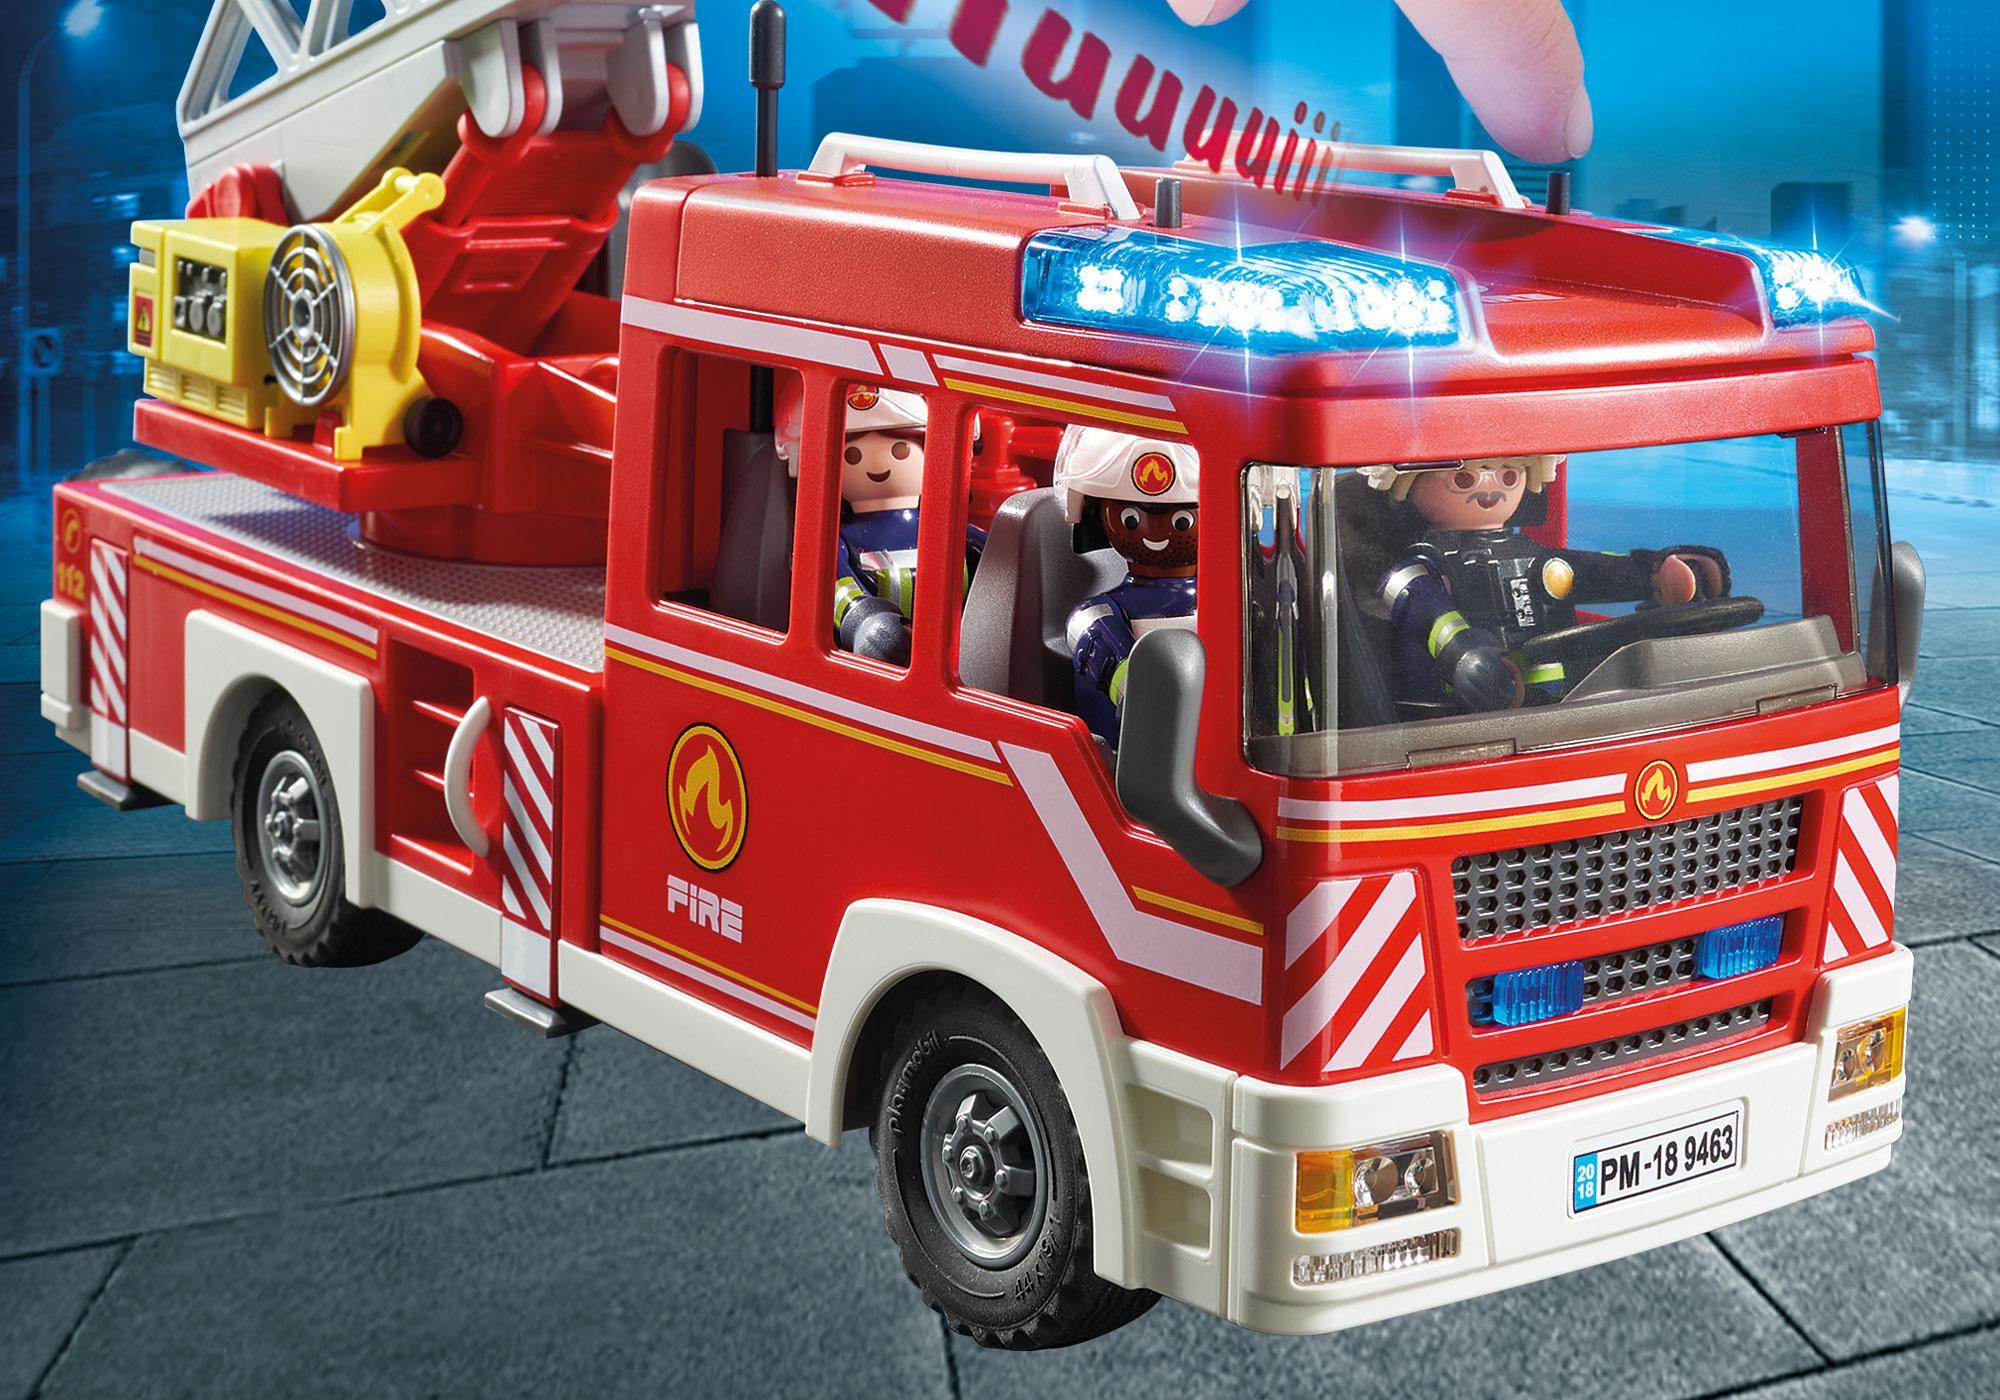 http://media.playmobil.com/i/playmobil/9463_product_extra1/Fire Ladder Unit